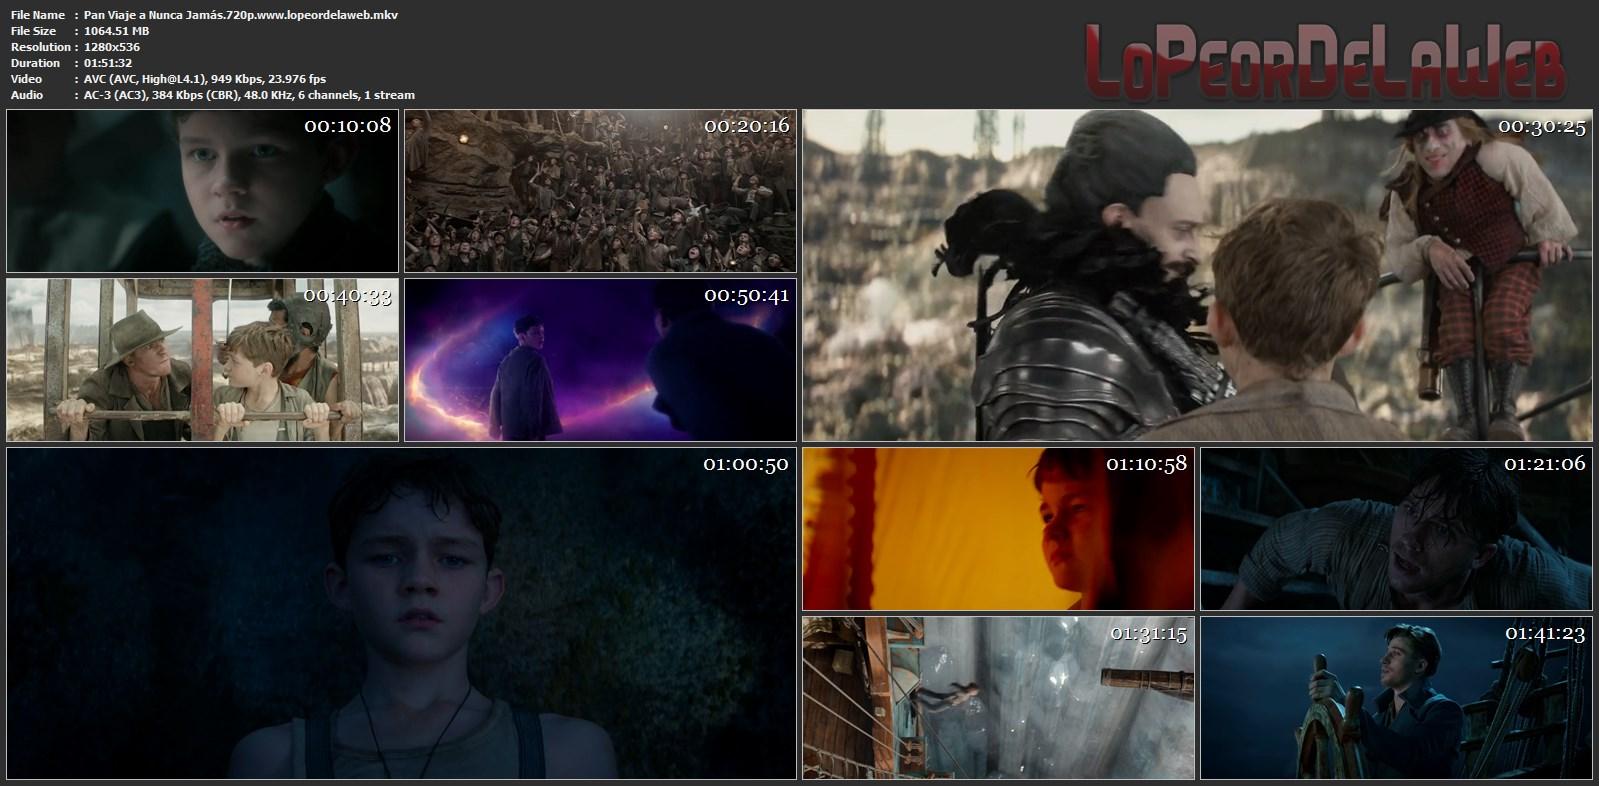 Pan: Viaje a Nunca Jamás BRrip 720p Latino 2015 [Mega]